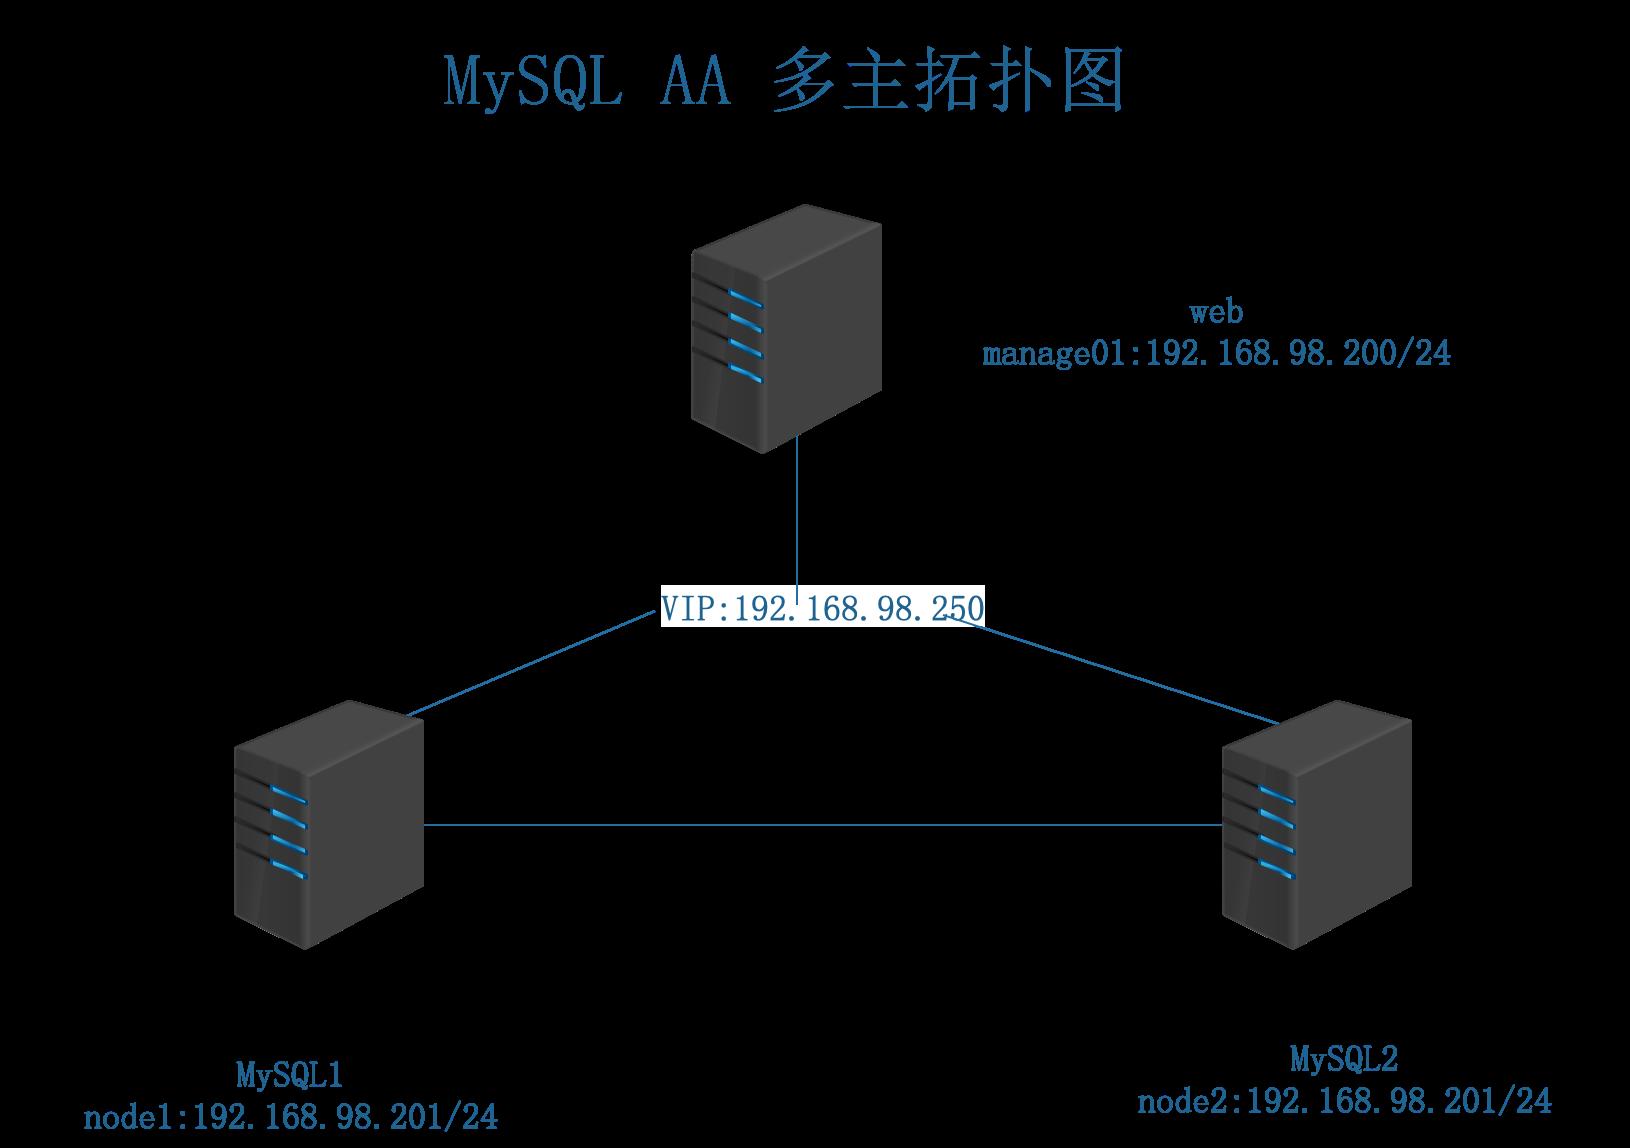 mysql_aa拓扑图.png